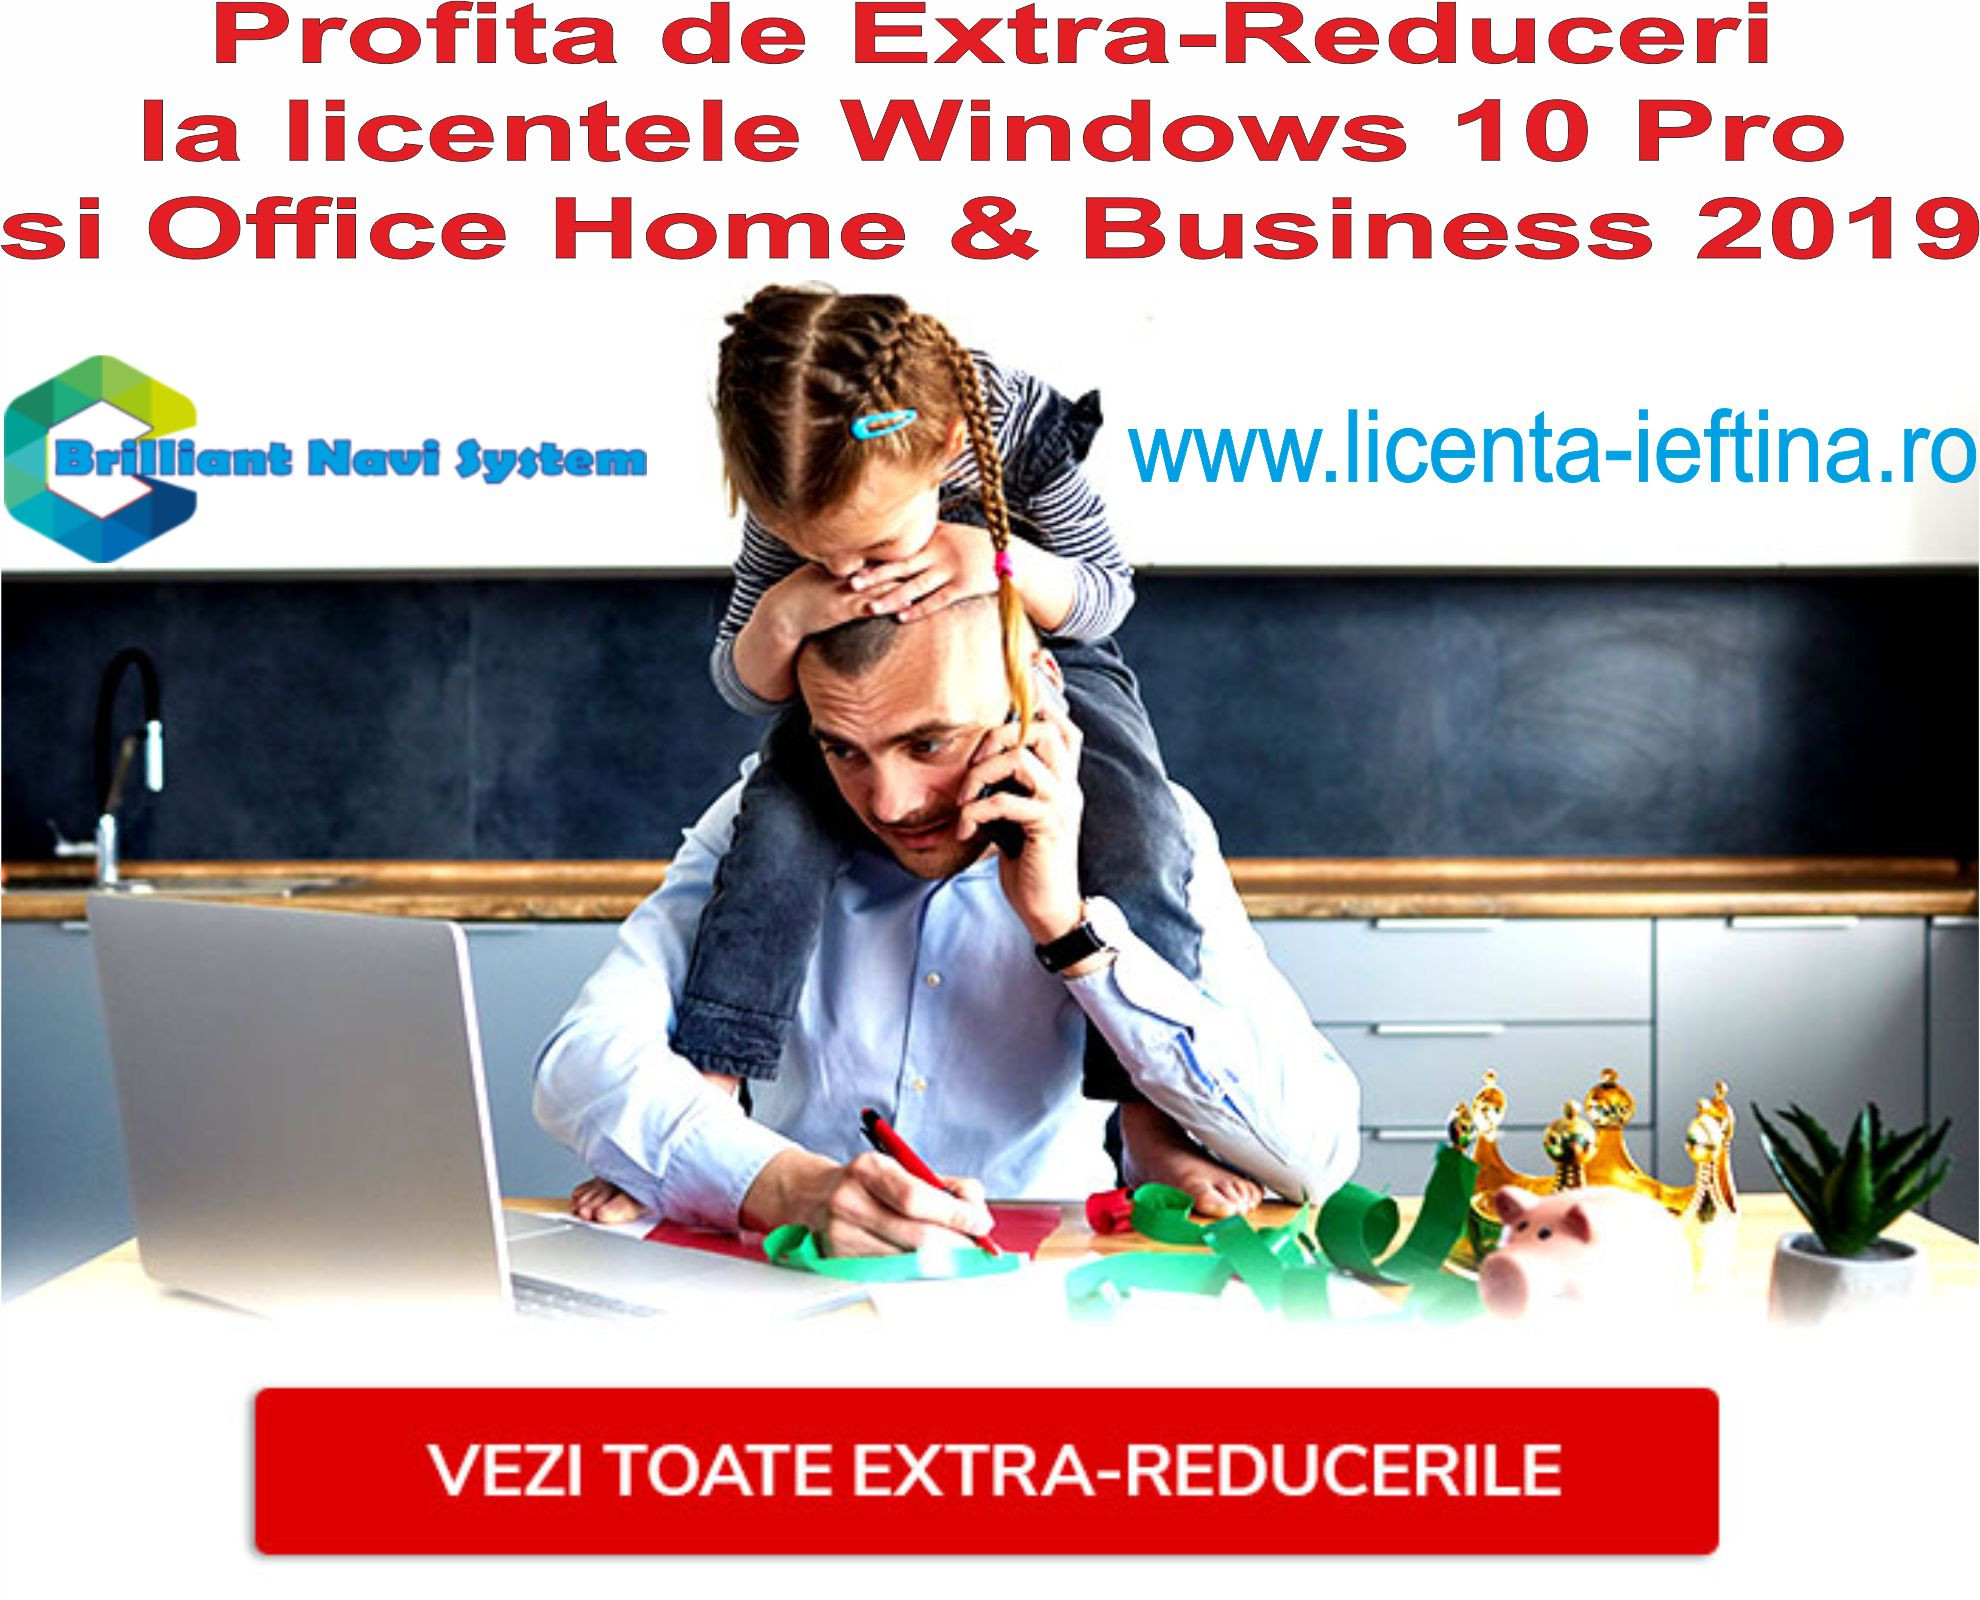 Licenta Ieftina